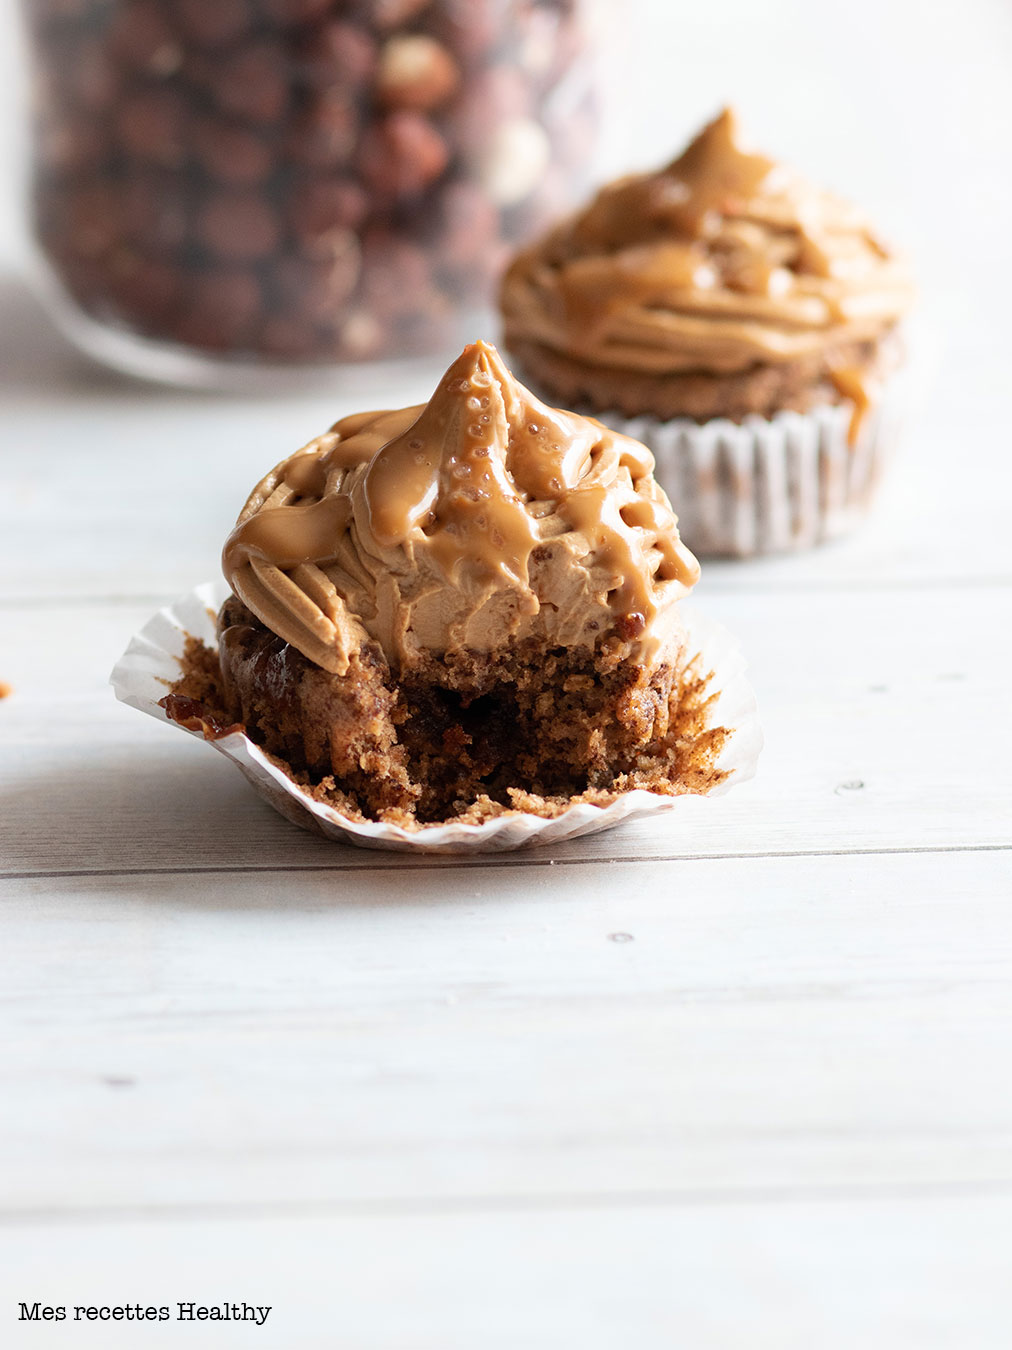 Cupcake au chocolat et caramel